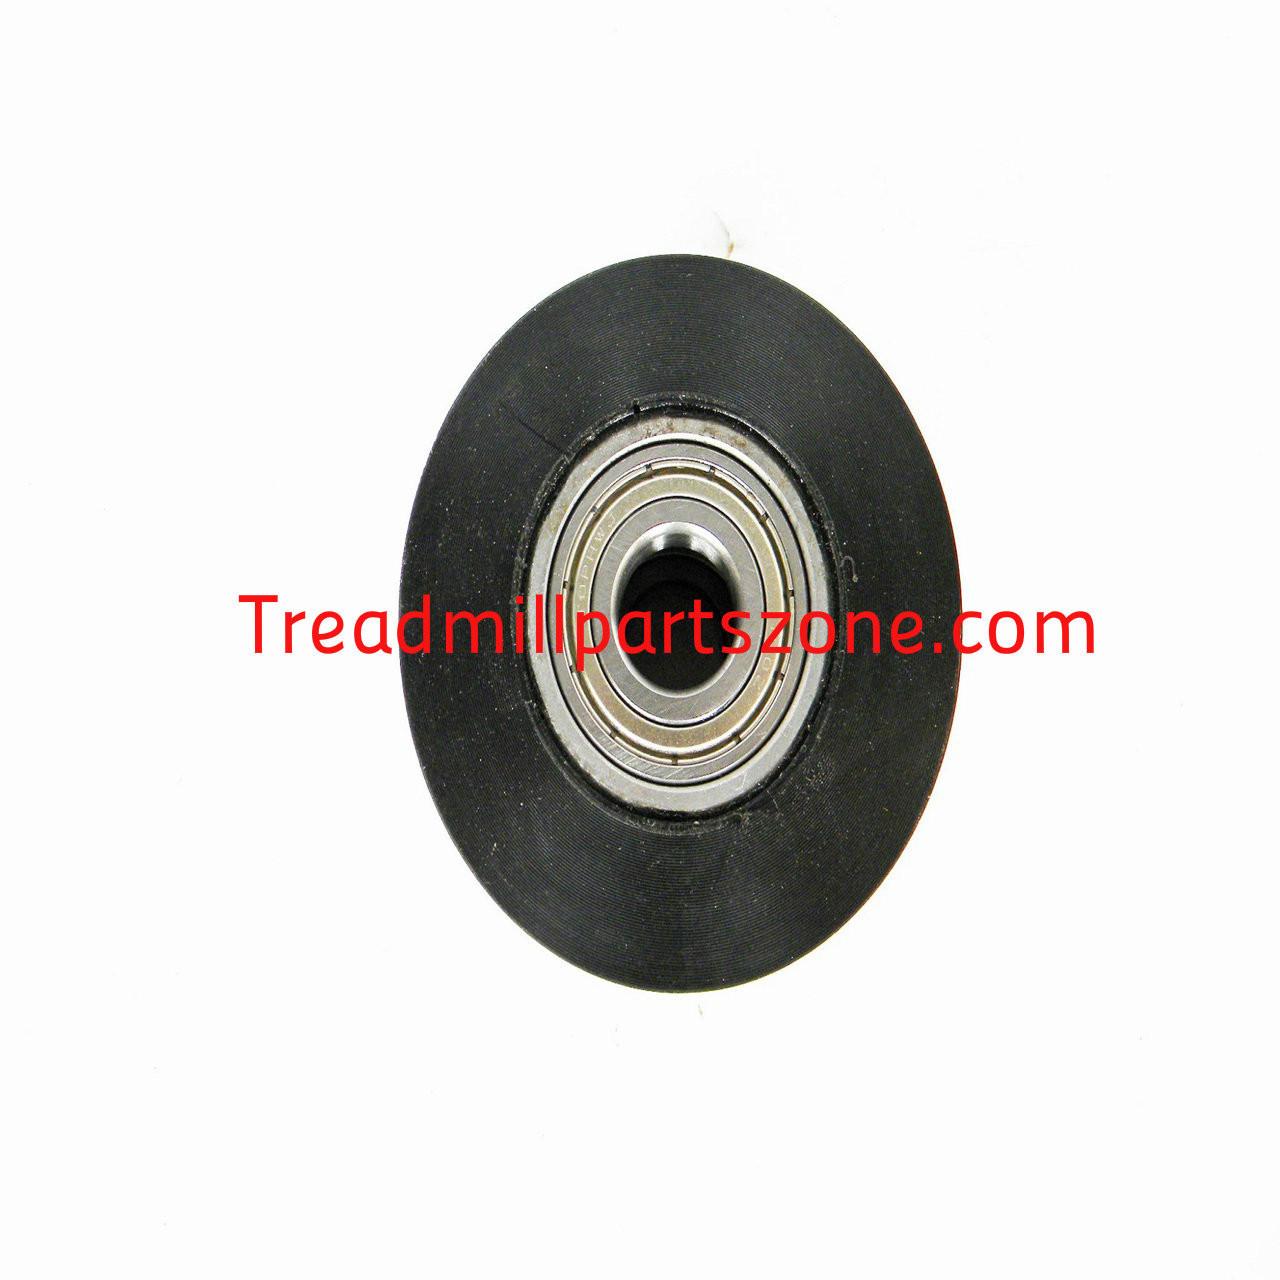 Pro Form Elliptical Model PFEL599112 18.0 RE Ramp Roller Part 316741